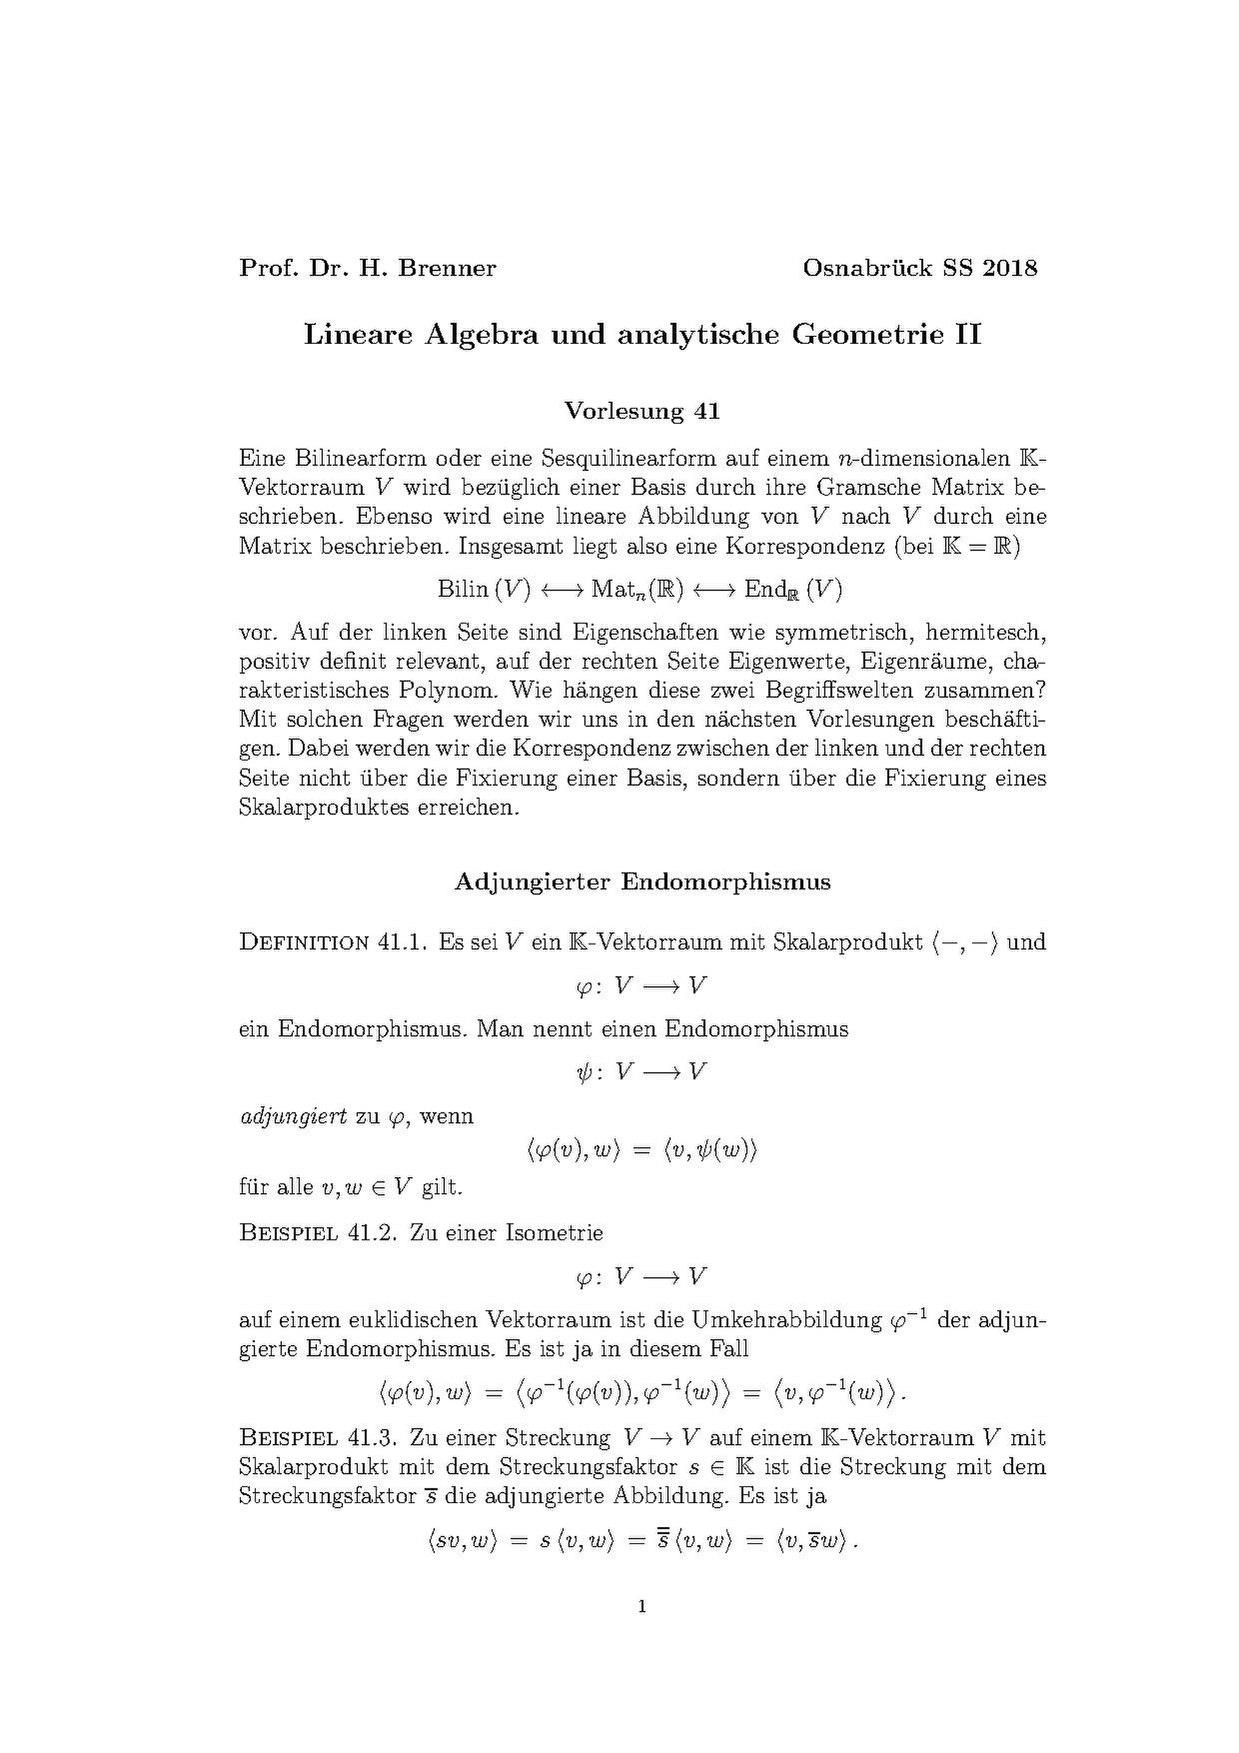 Lineare algebra 1 vorlesung online dating 10